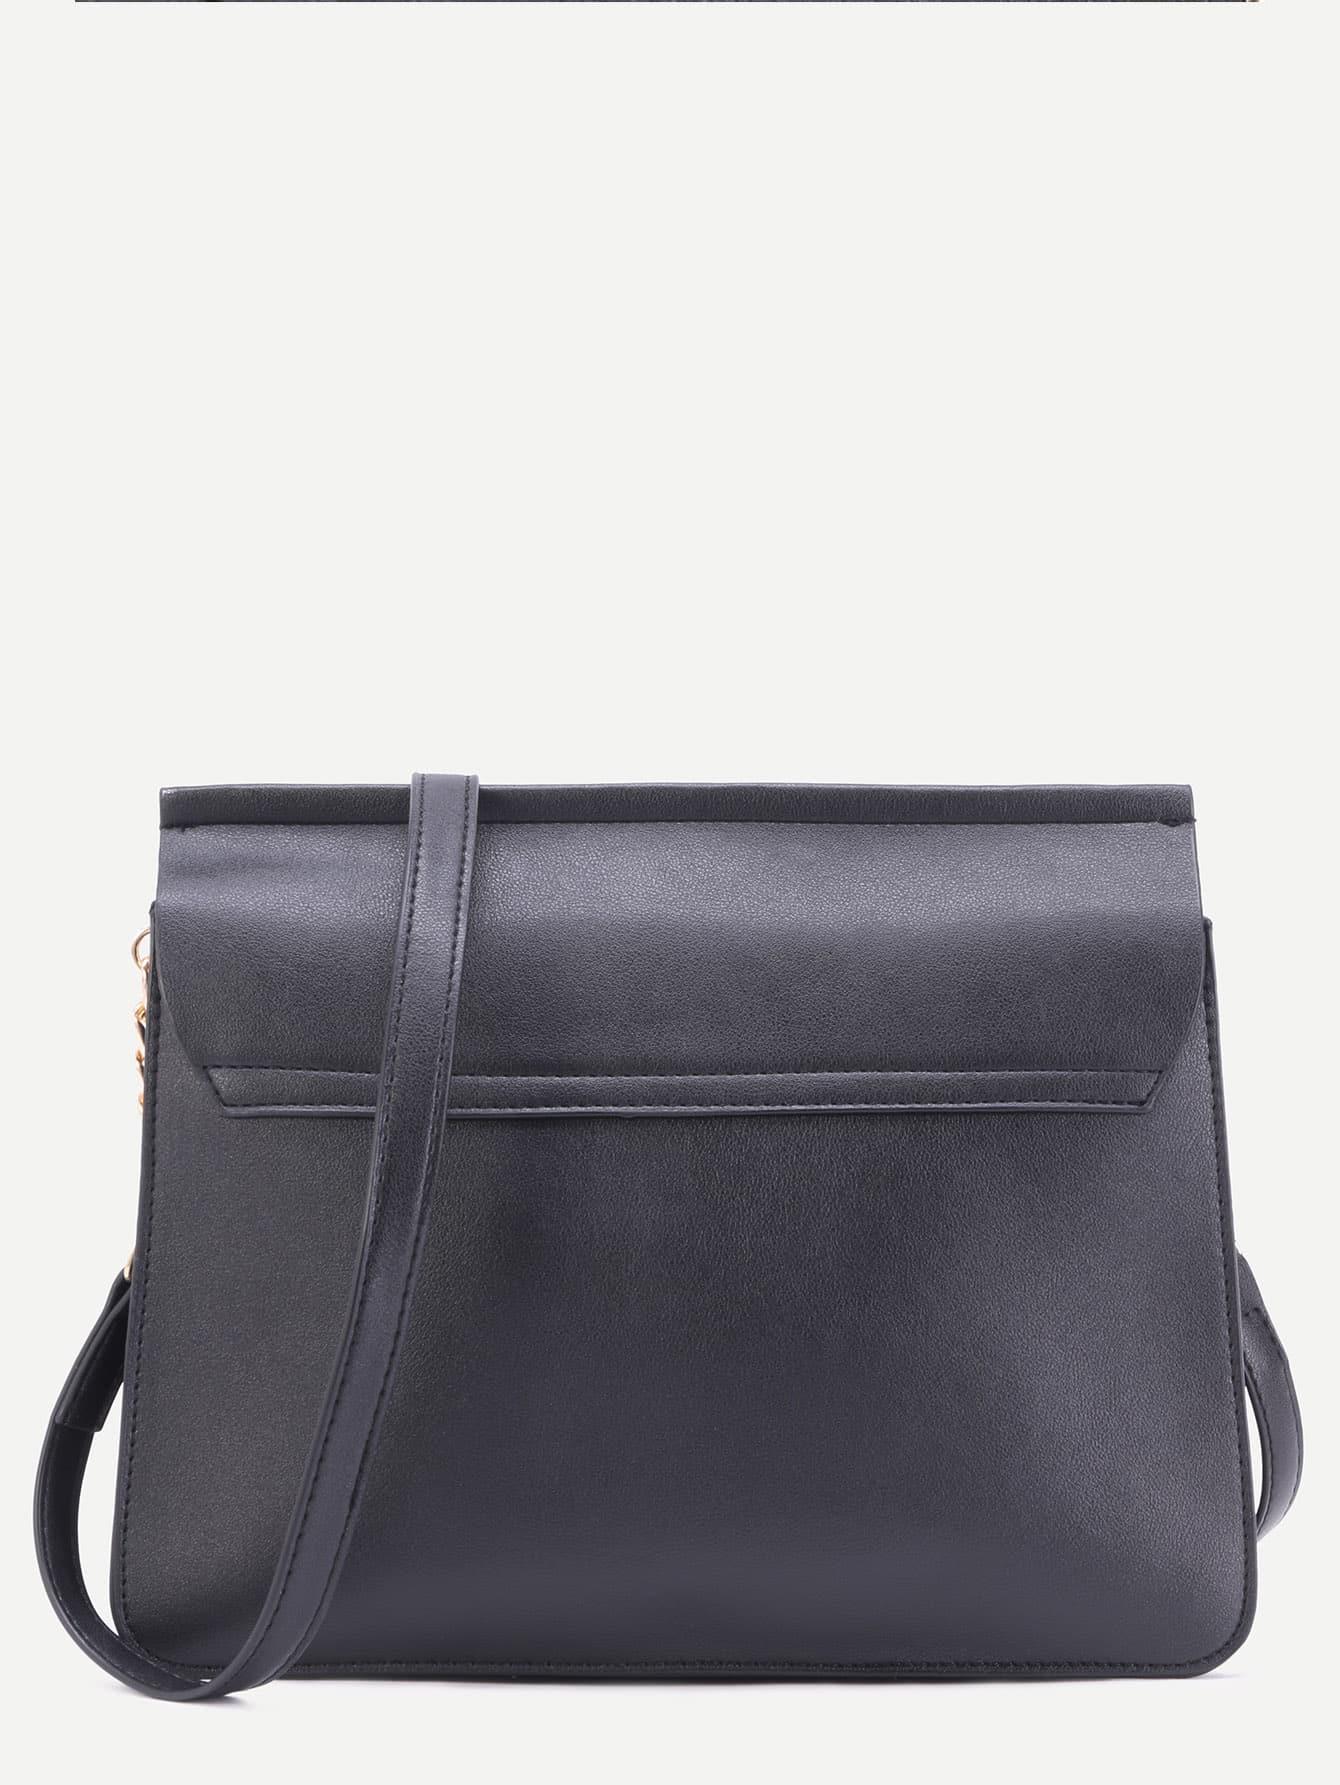 bag161003007_1